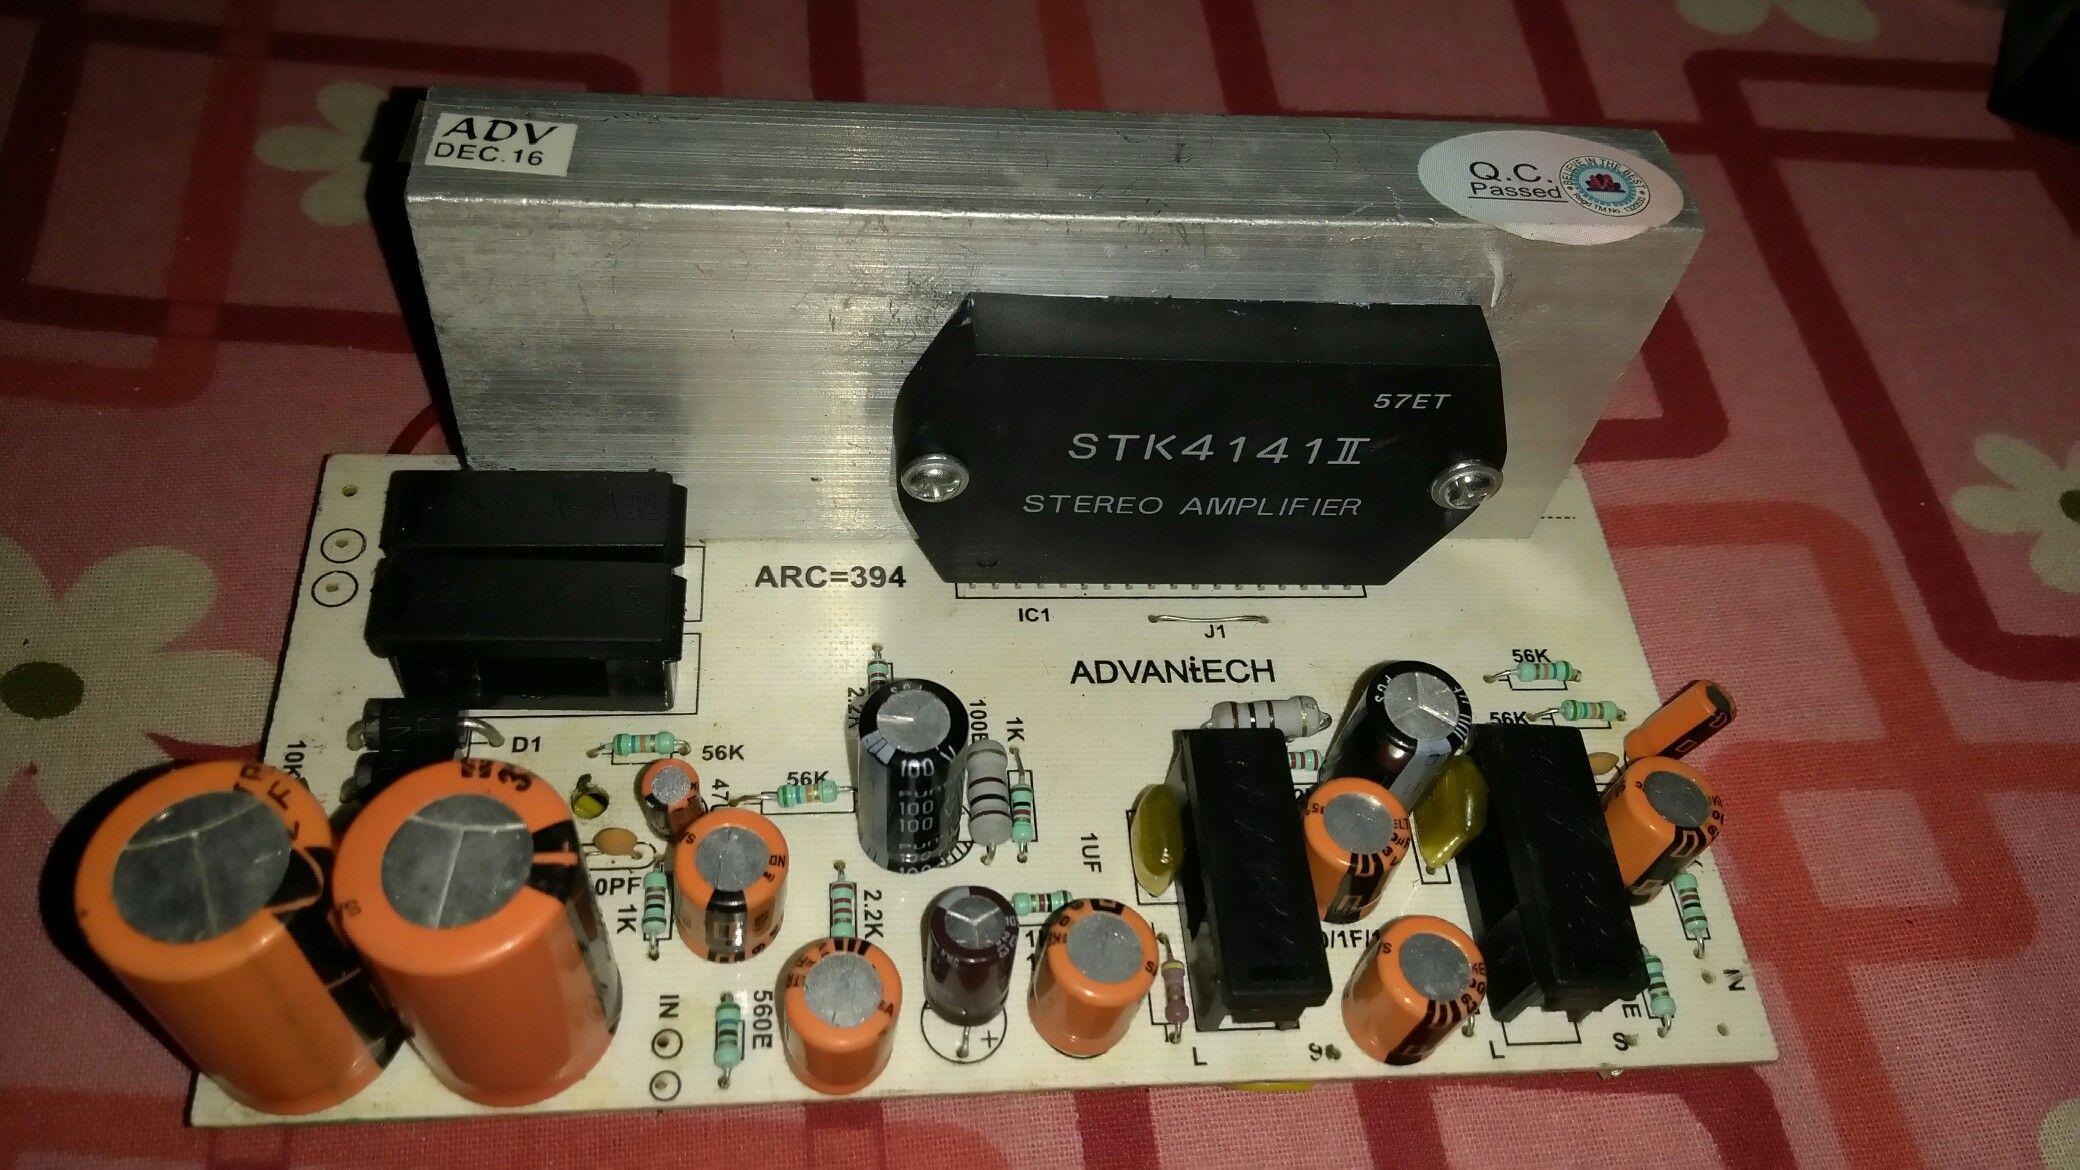 Stk 4141 high quality | electronic